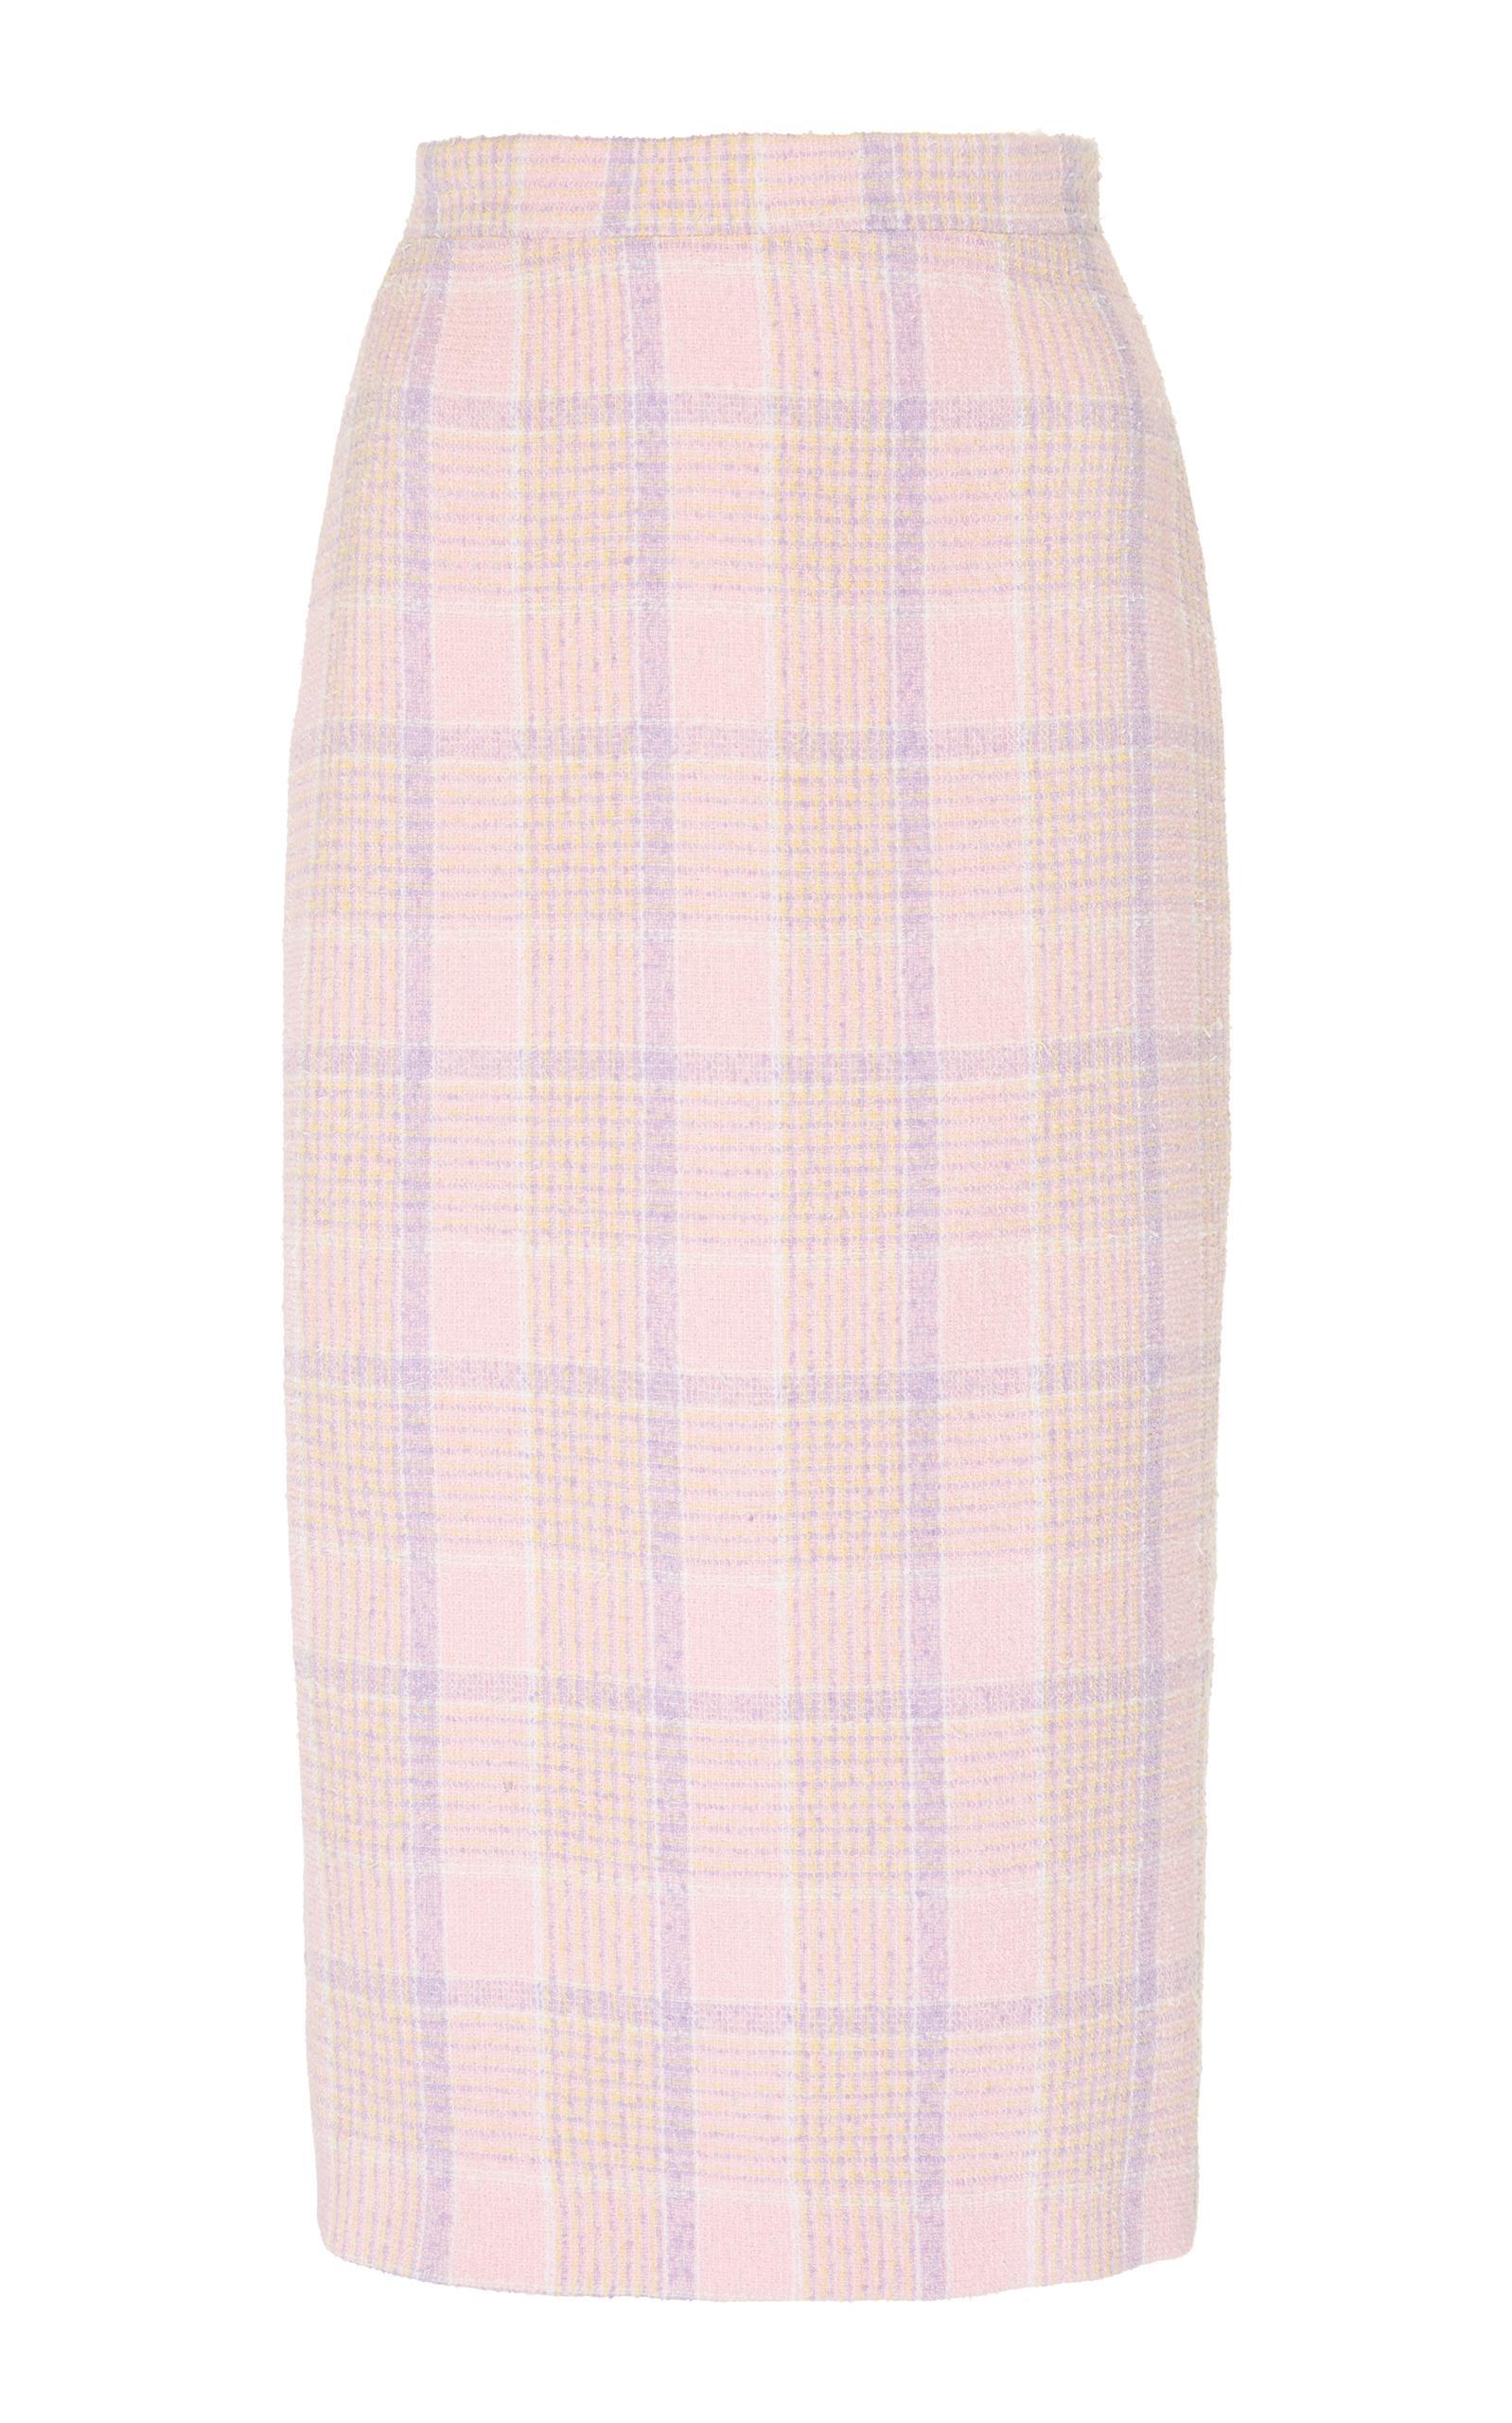 Alessandra Rich Tartan Tweed Pencil Skirt In Pink